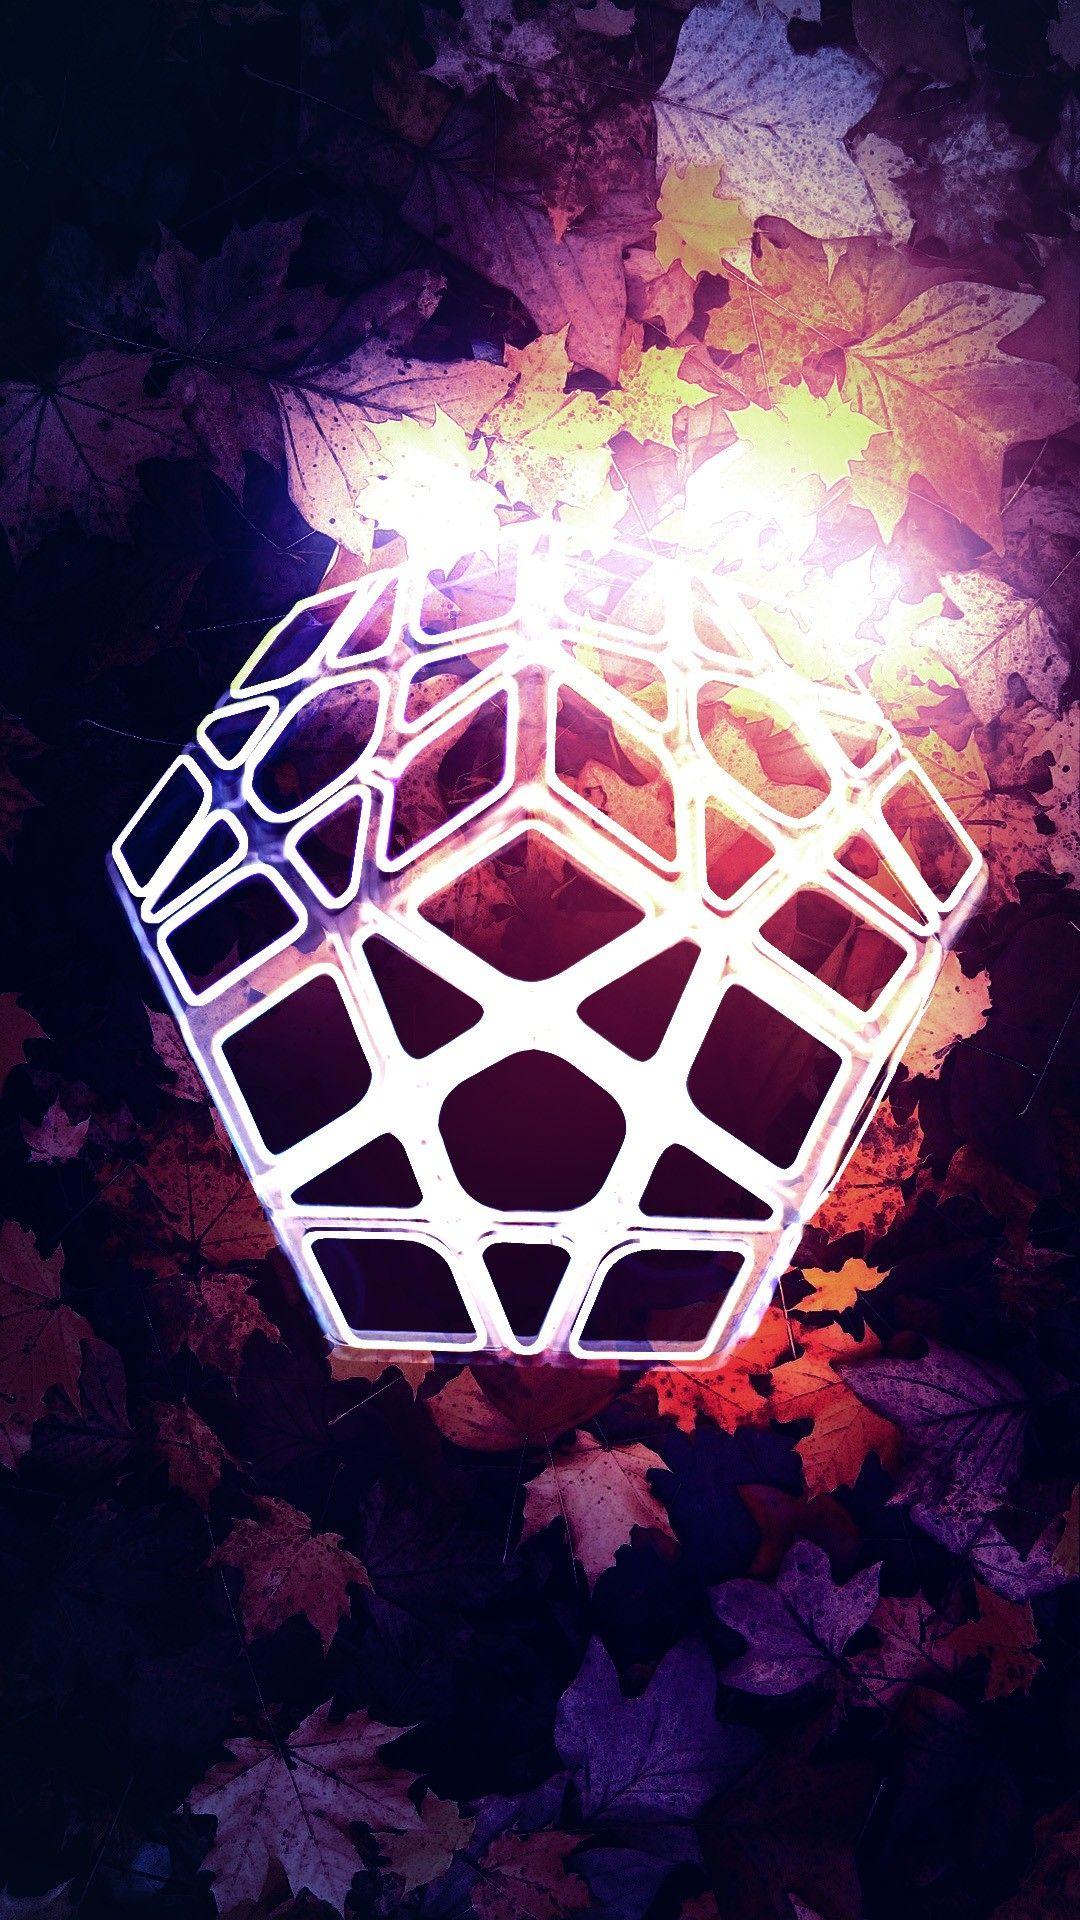 Megaminx Wallpaper Rubik Cube In 2020 Wallpaper Rubiks Cube Cube